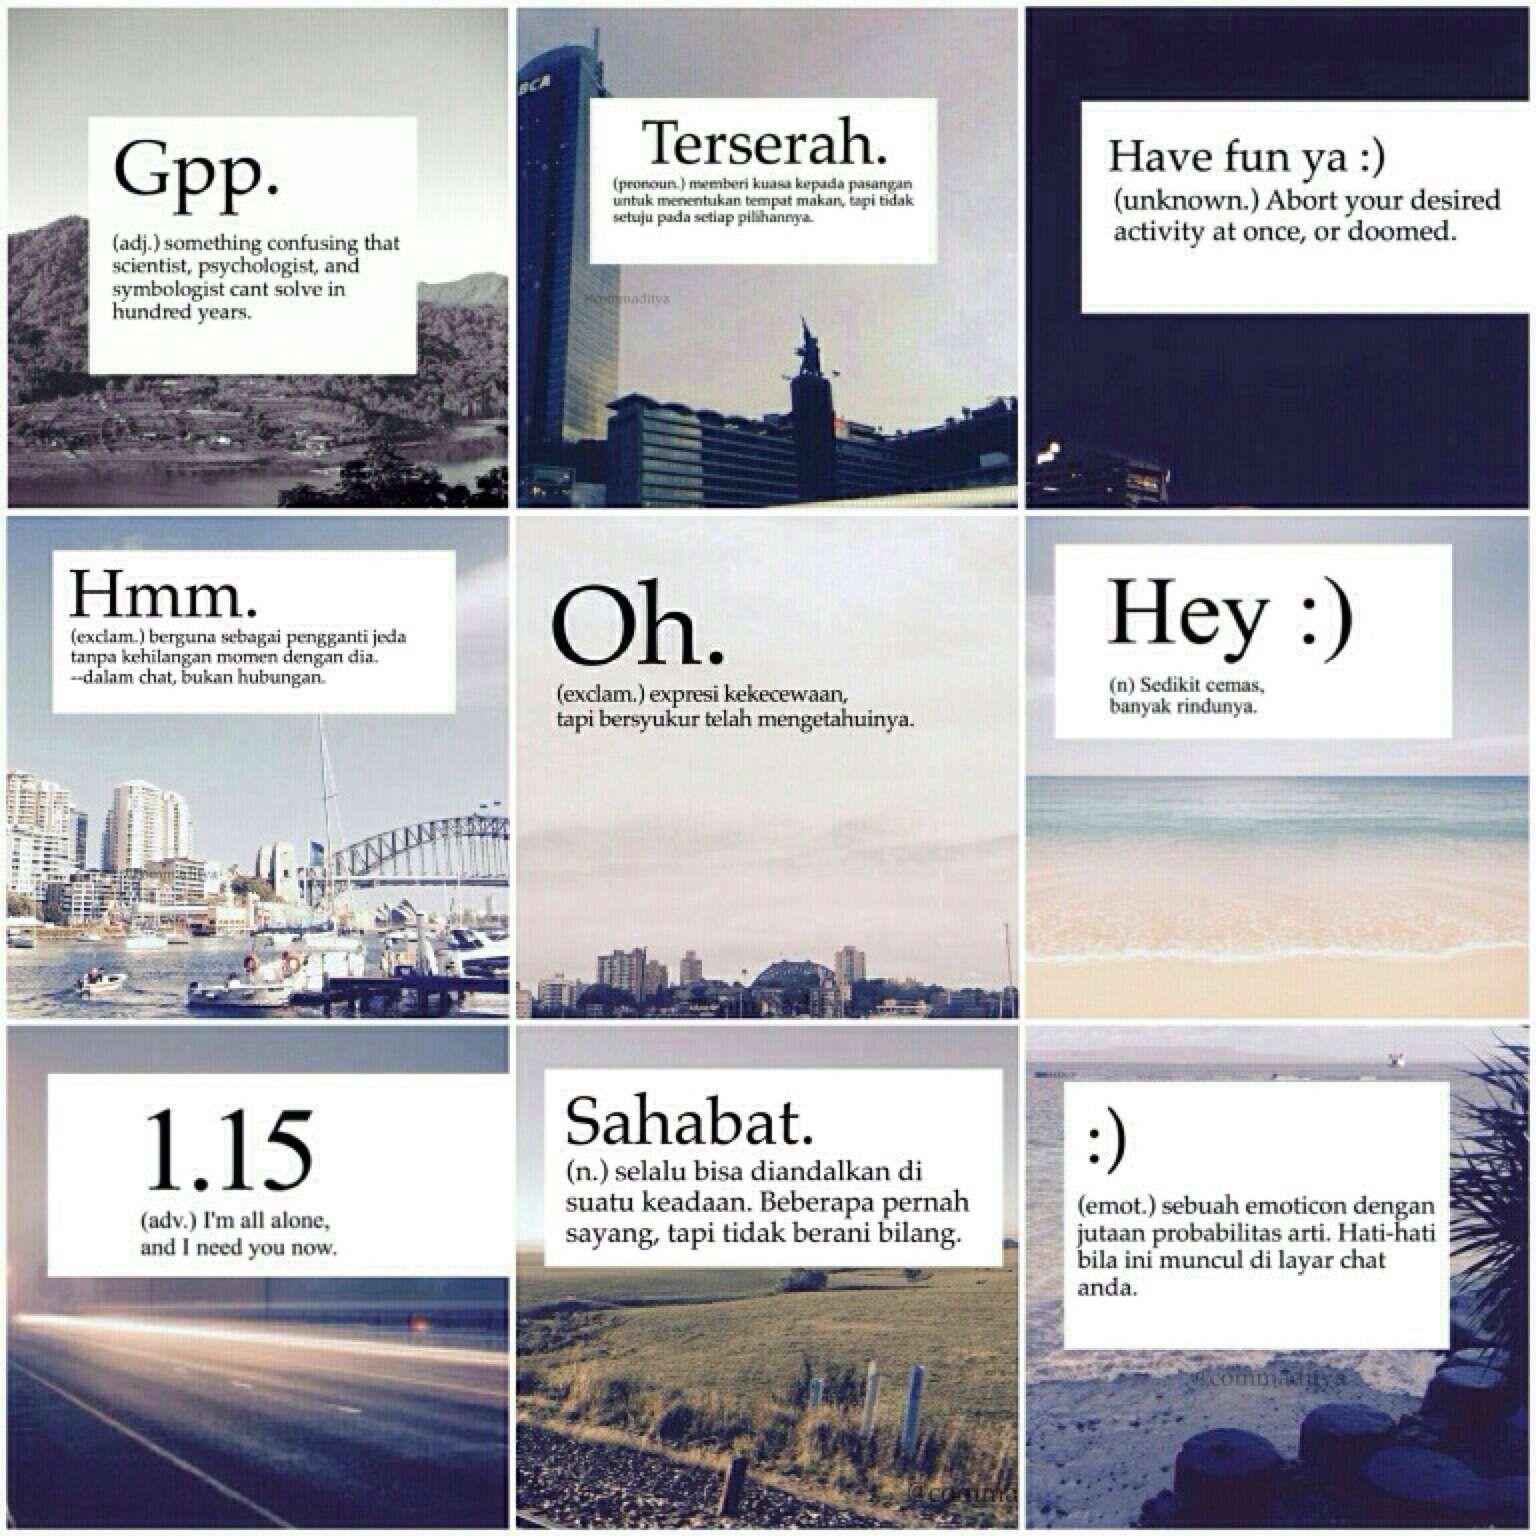 Kompilasi Kamus Slebor Kutipan Lucu Kutipan Hidup Fakta Lucu